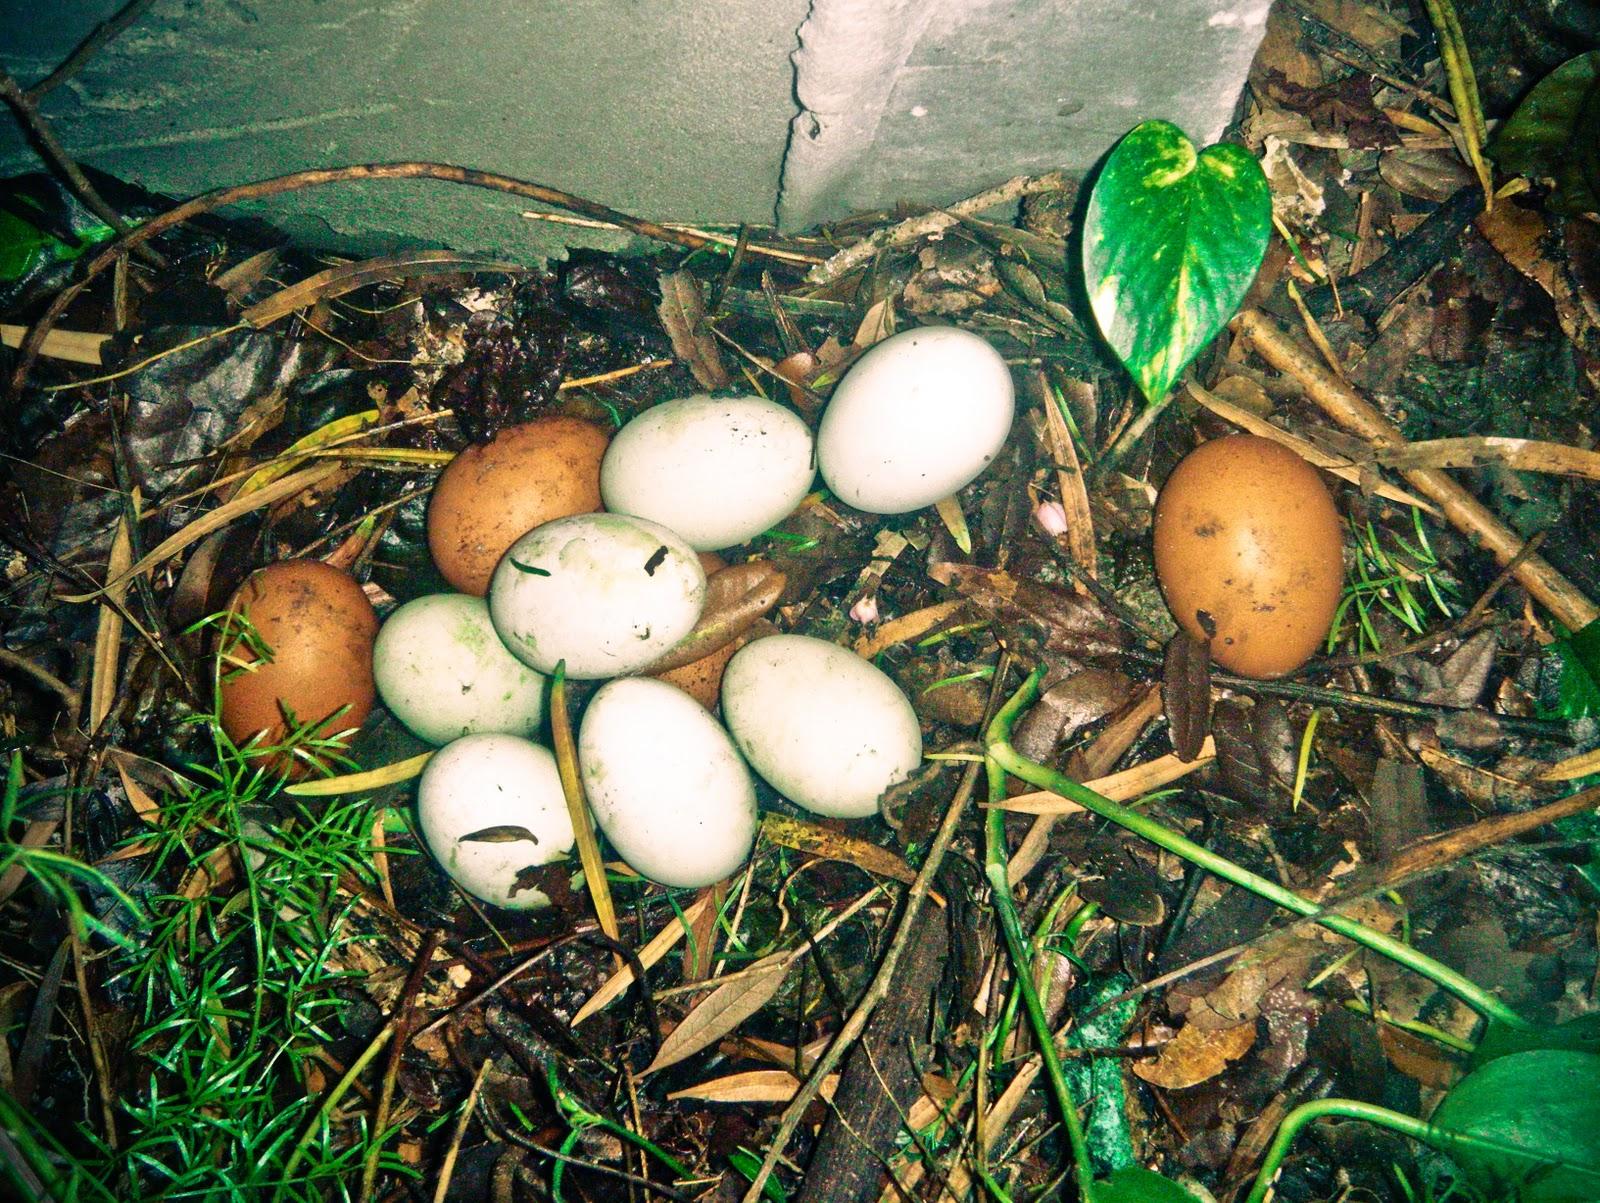 http://2.bp.blogspot.com/_HpE_3Cd7-sw/TNPp6SPgFkI/AAAAAAAADMg/AK_1GFdiZs4/s1600/eggs.jpg